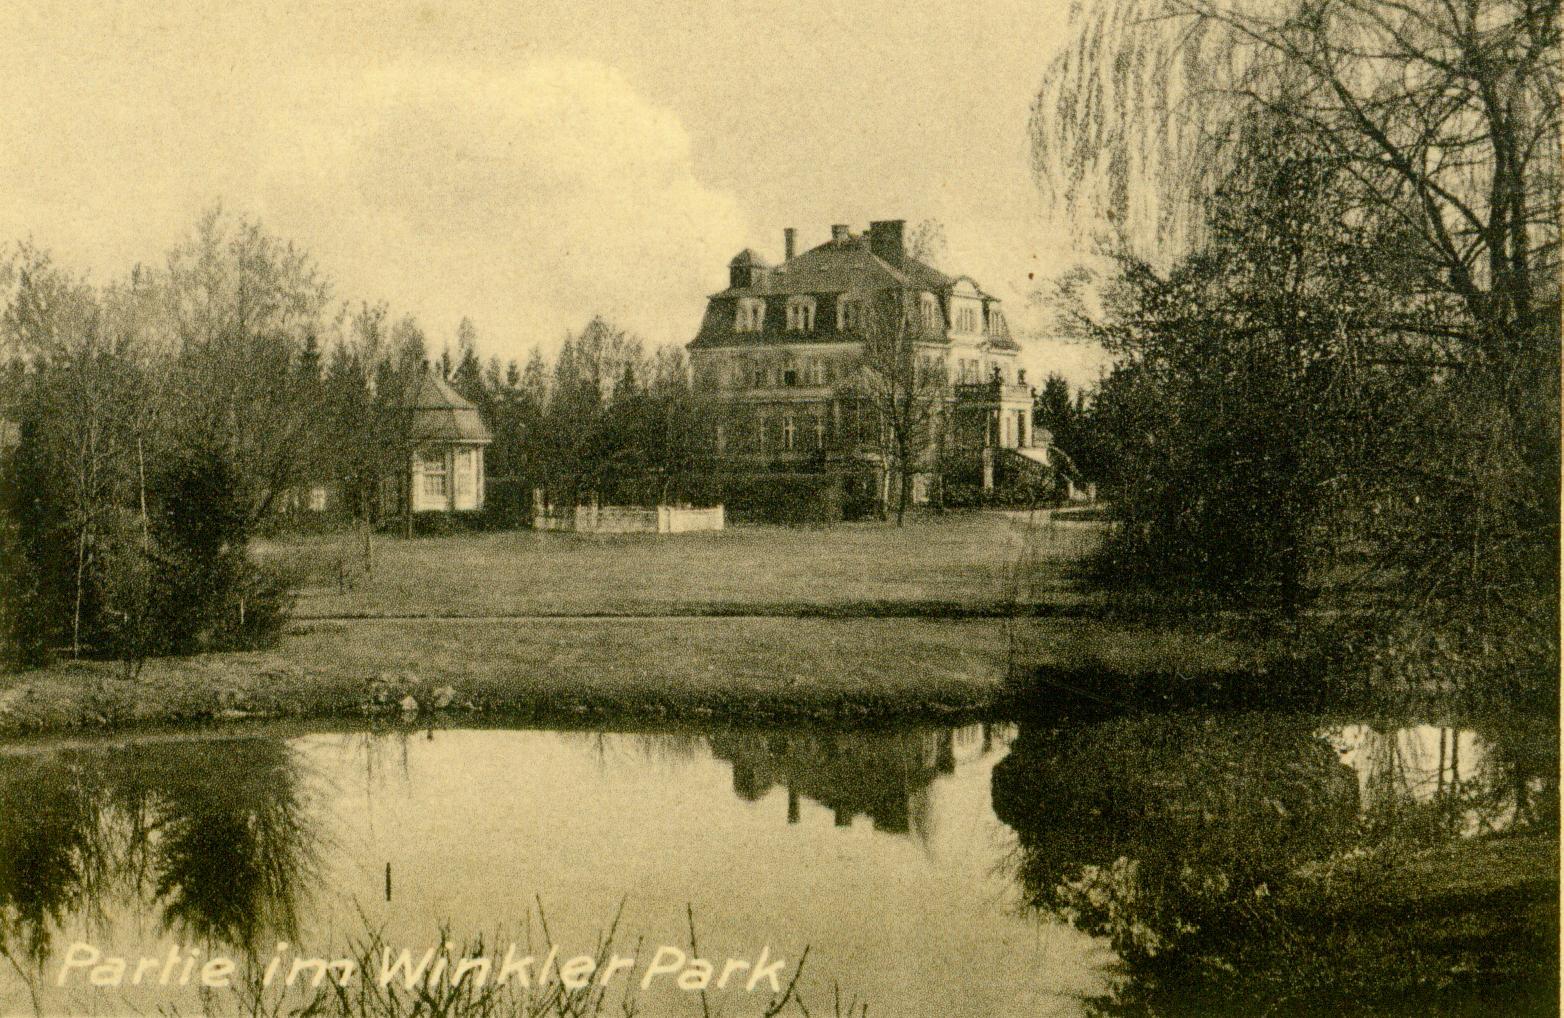 Ilowa-willa Winklera i park